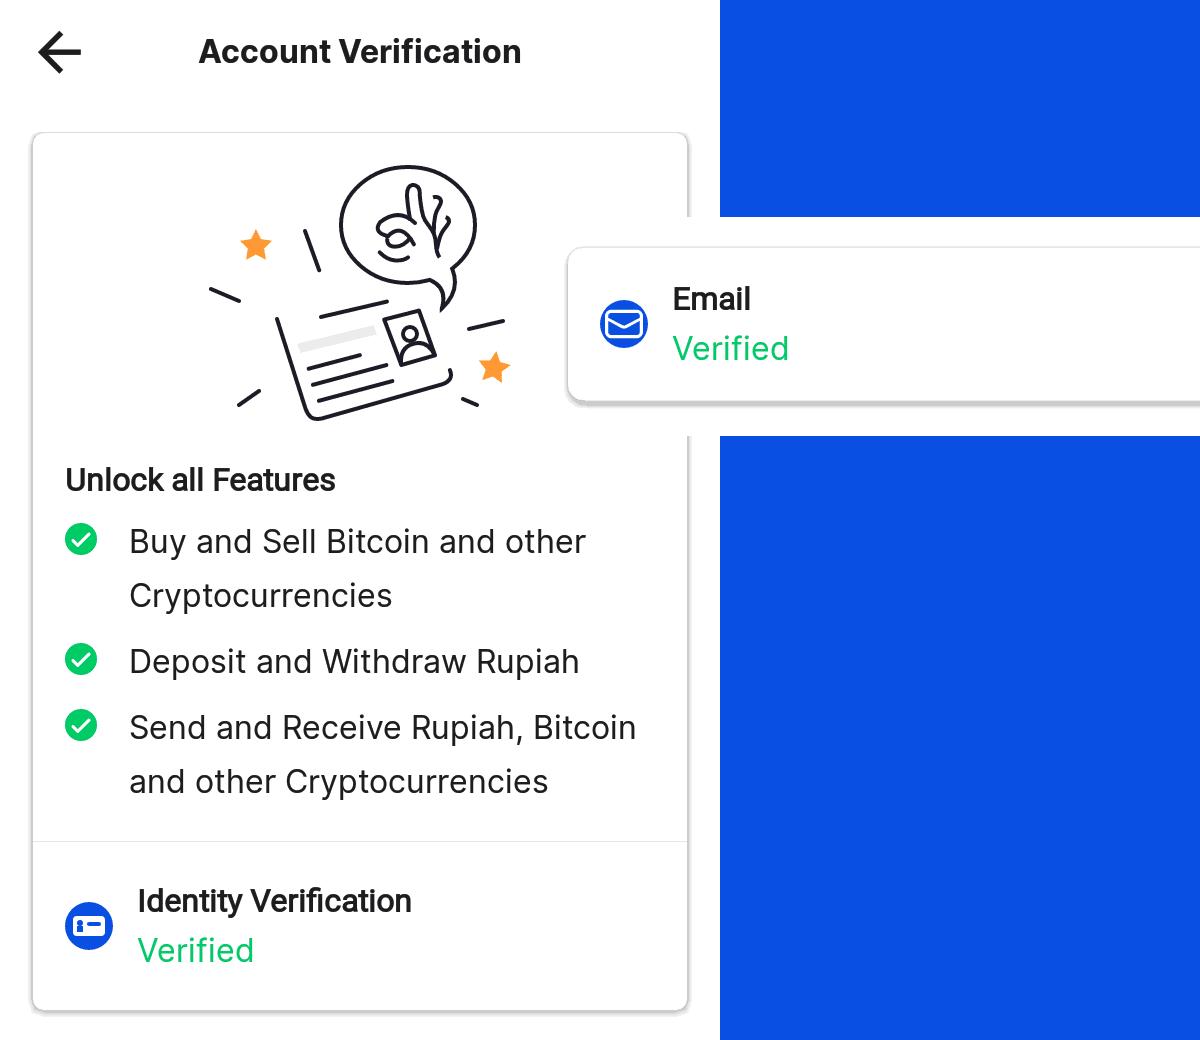 image of Pintu's Account Verification